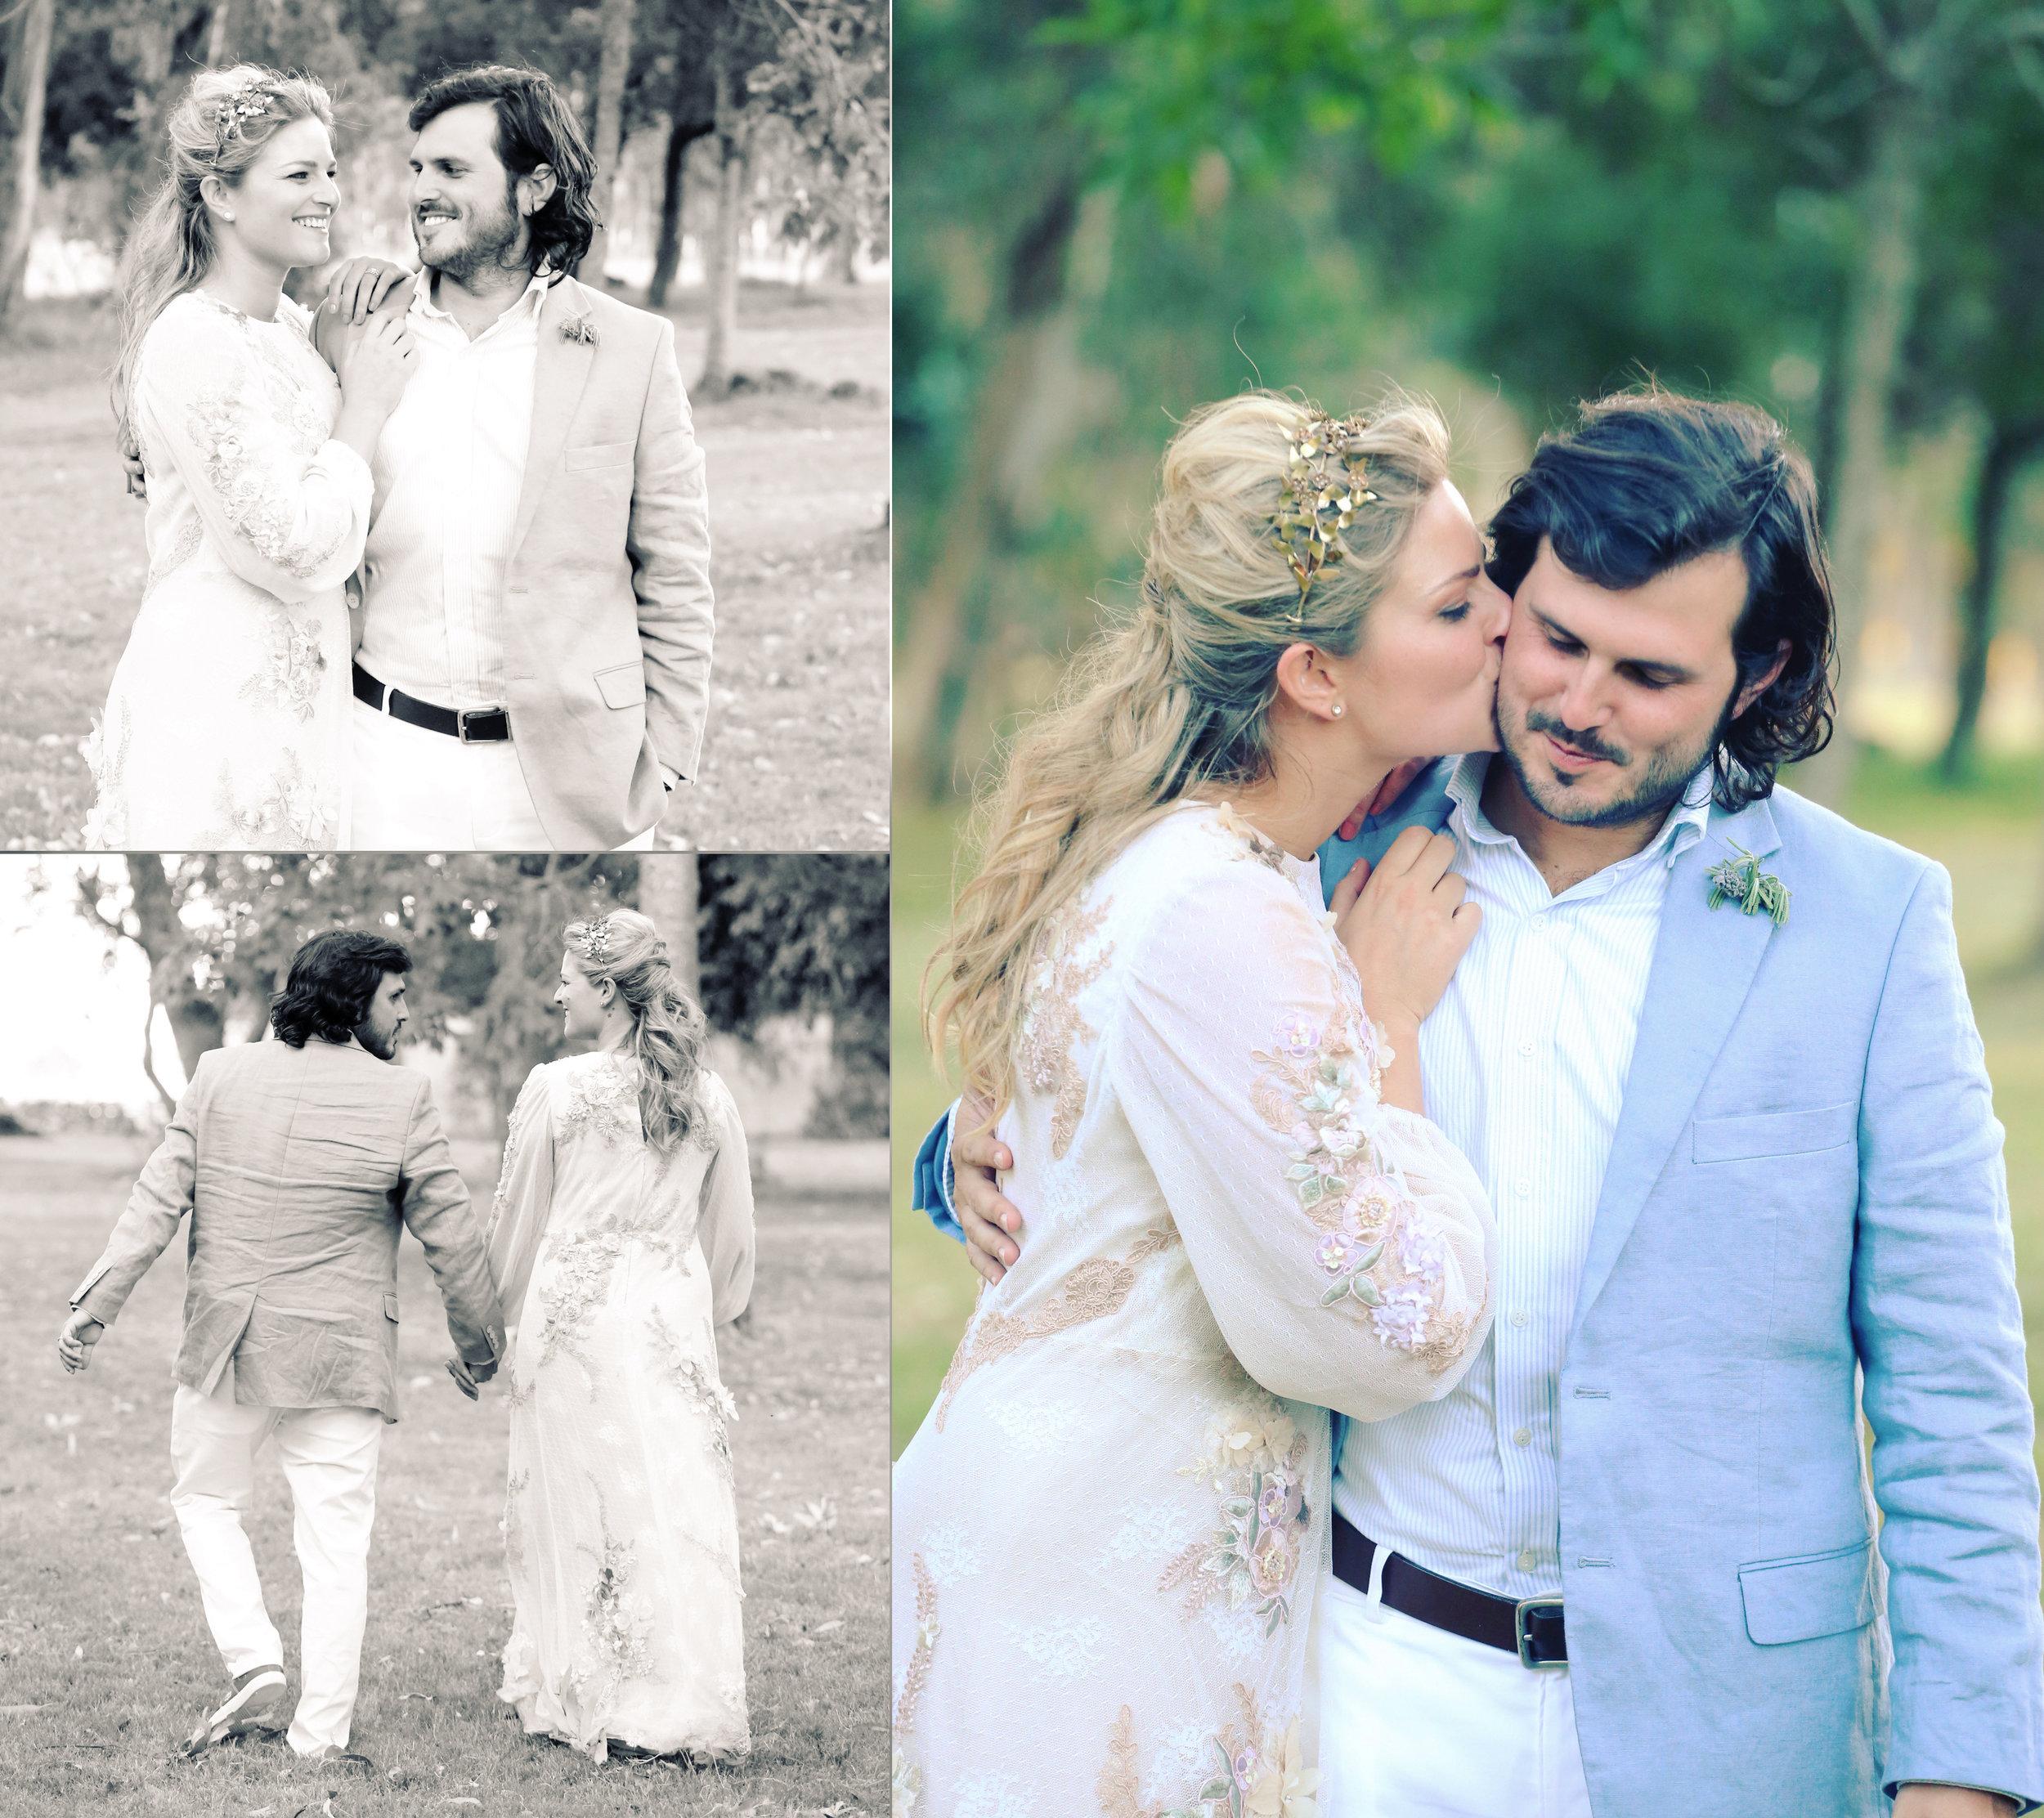 14-Fotografía-Bodas-Casamiento-Eventos-Fiesta-Diego-Piuma.jpg